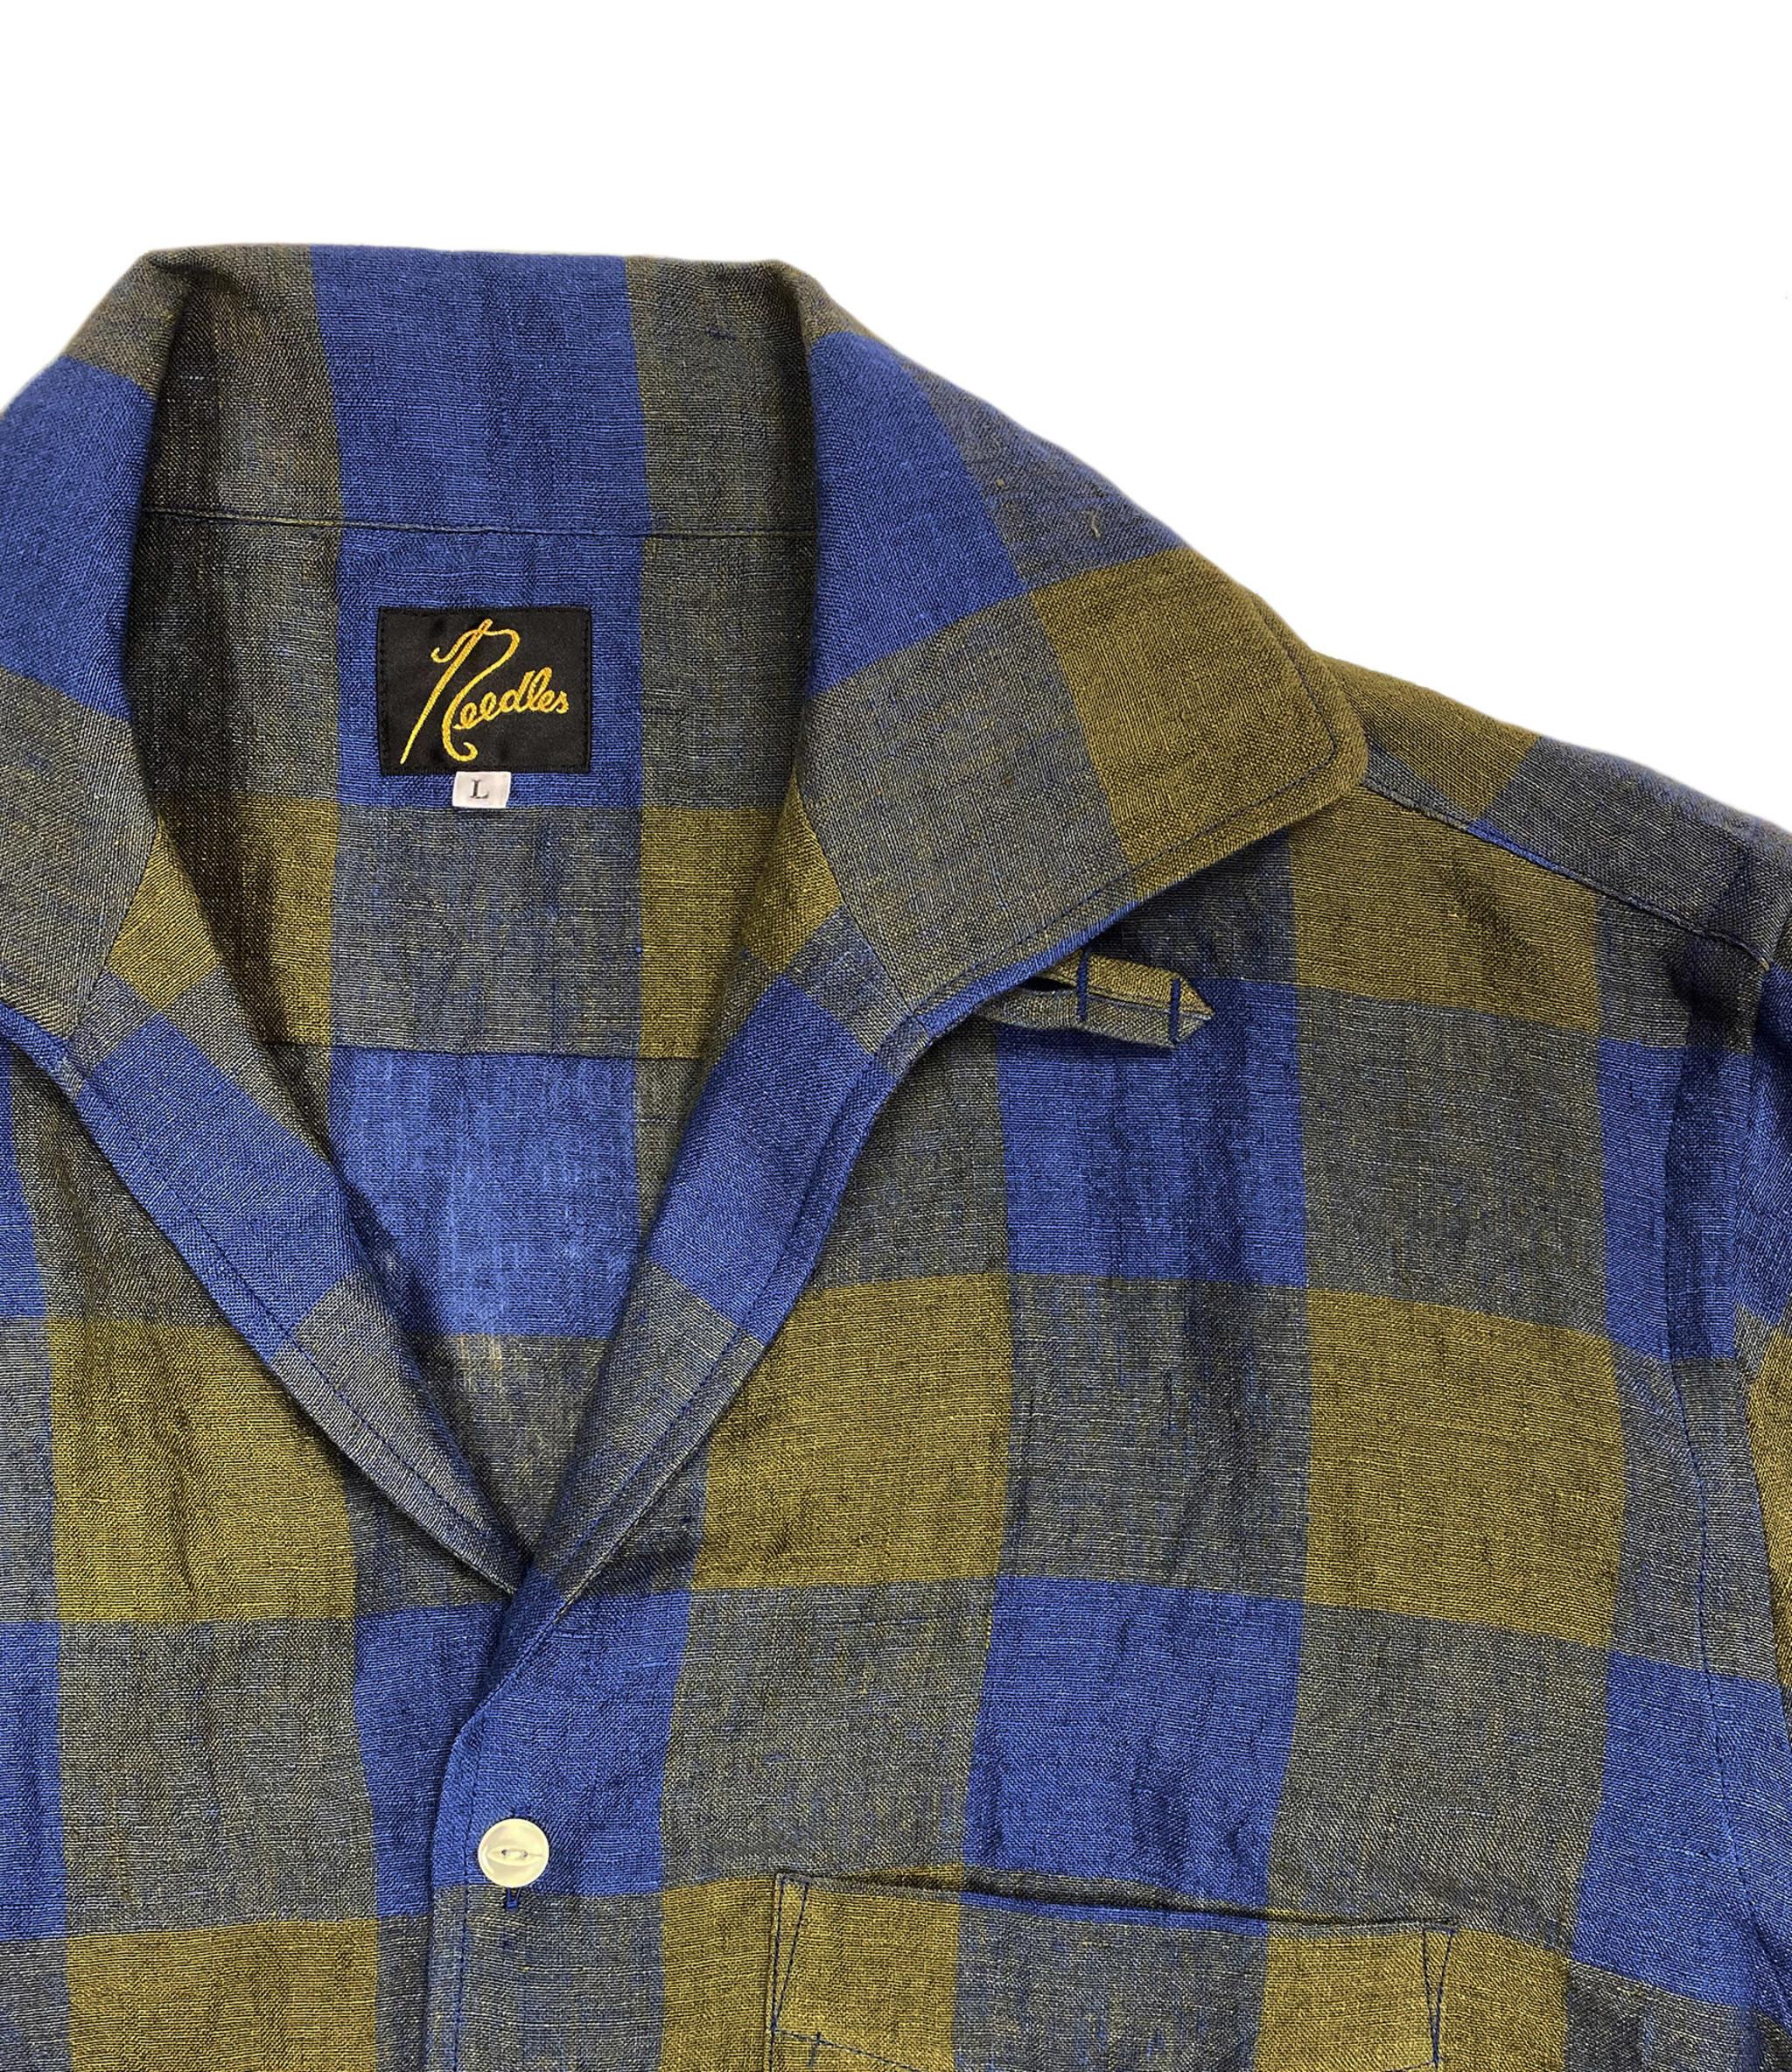 Needles Cut-Off Bottom Italian Collar Shirt - Linen/Gingham - Olive